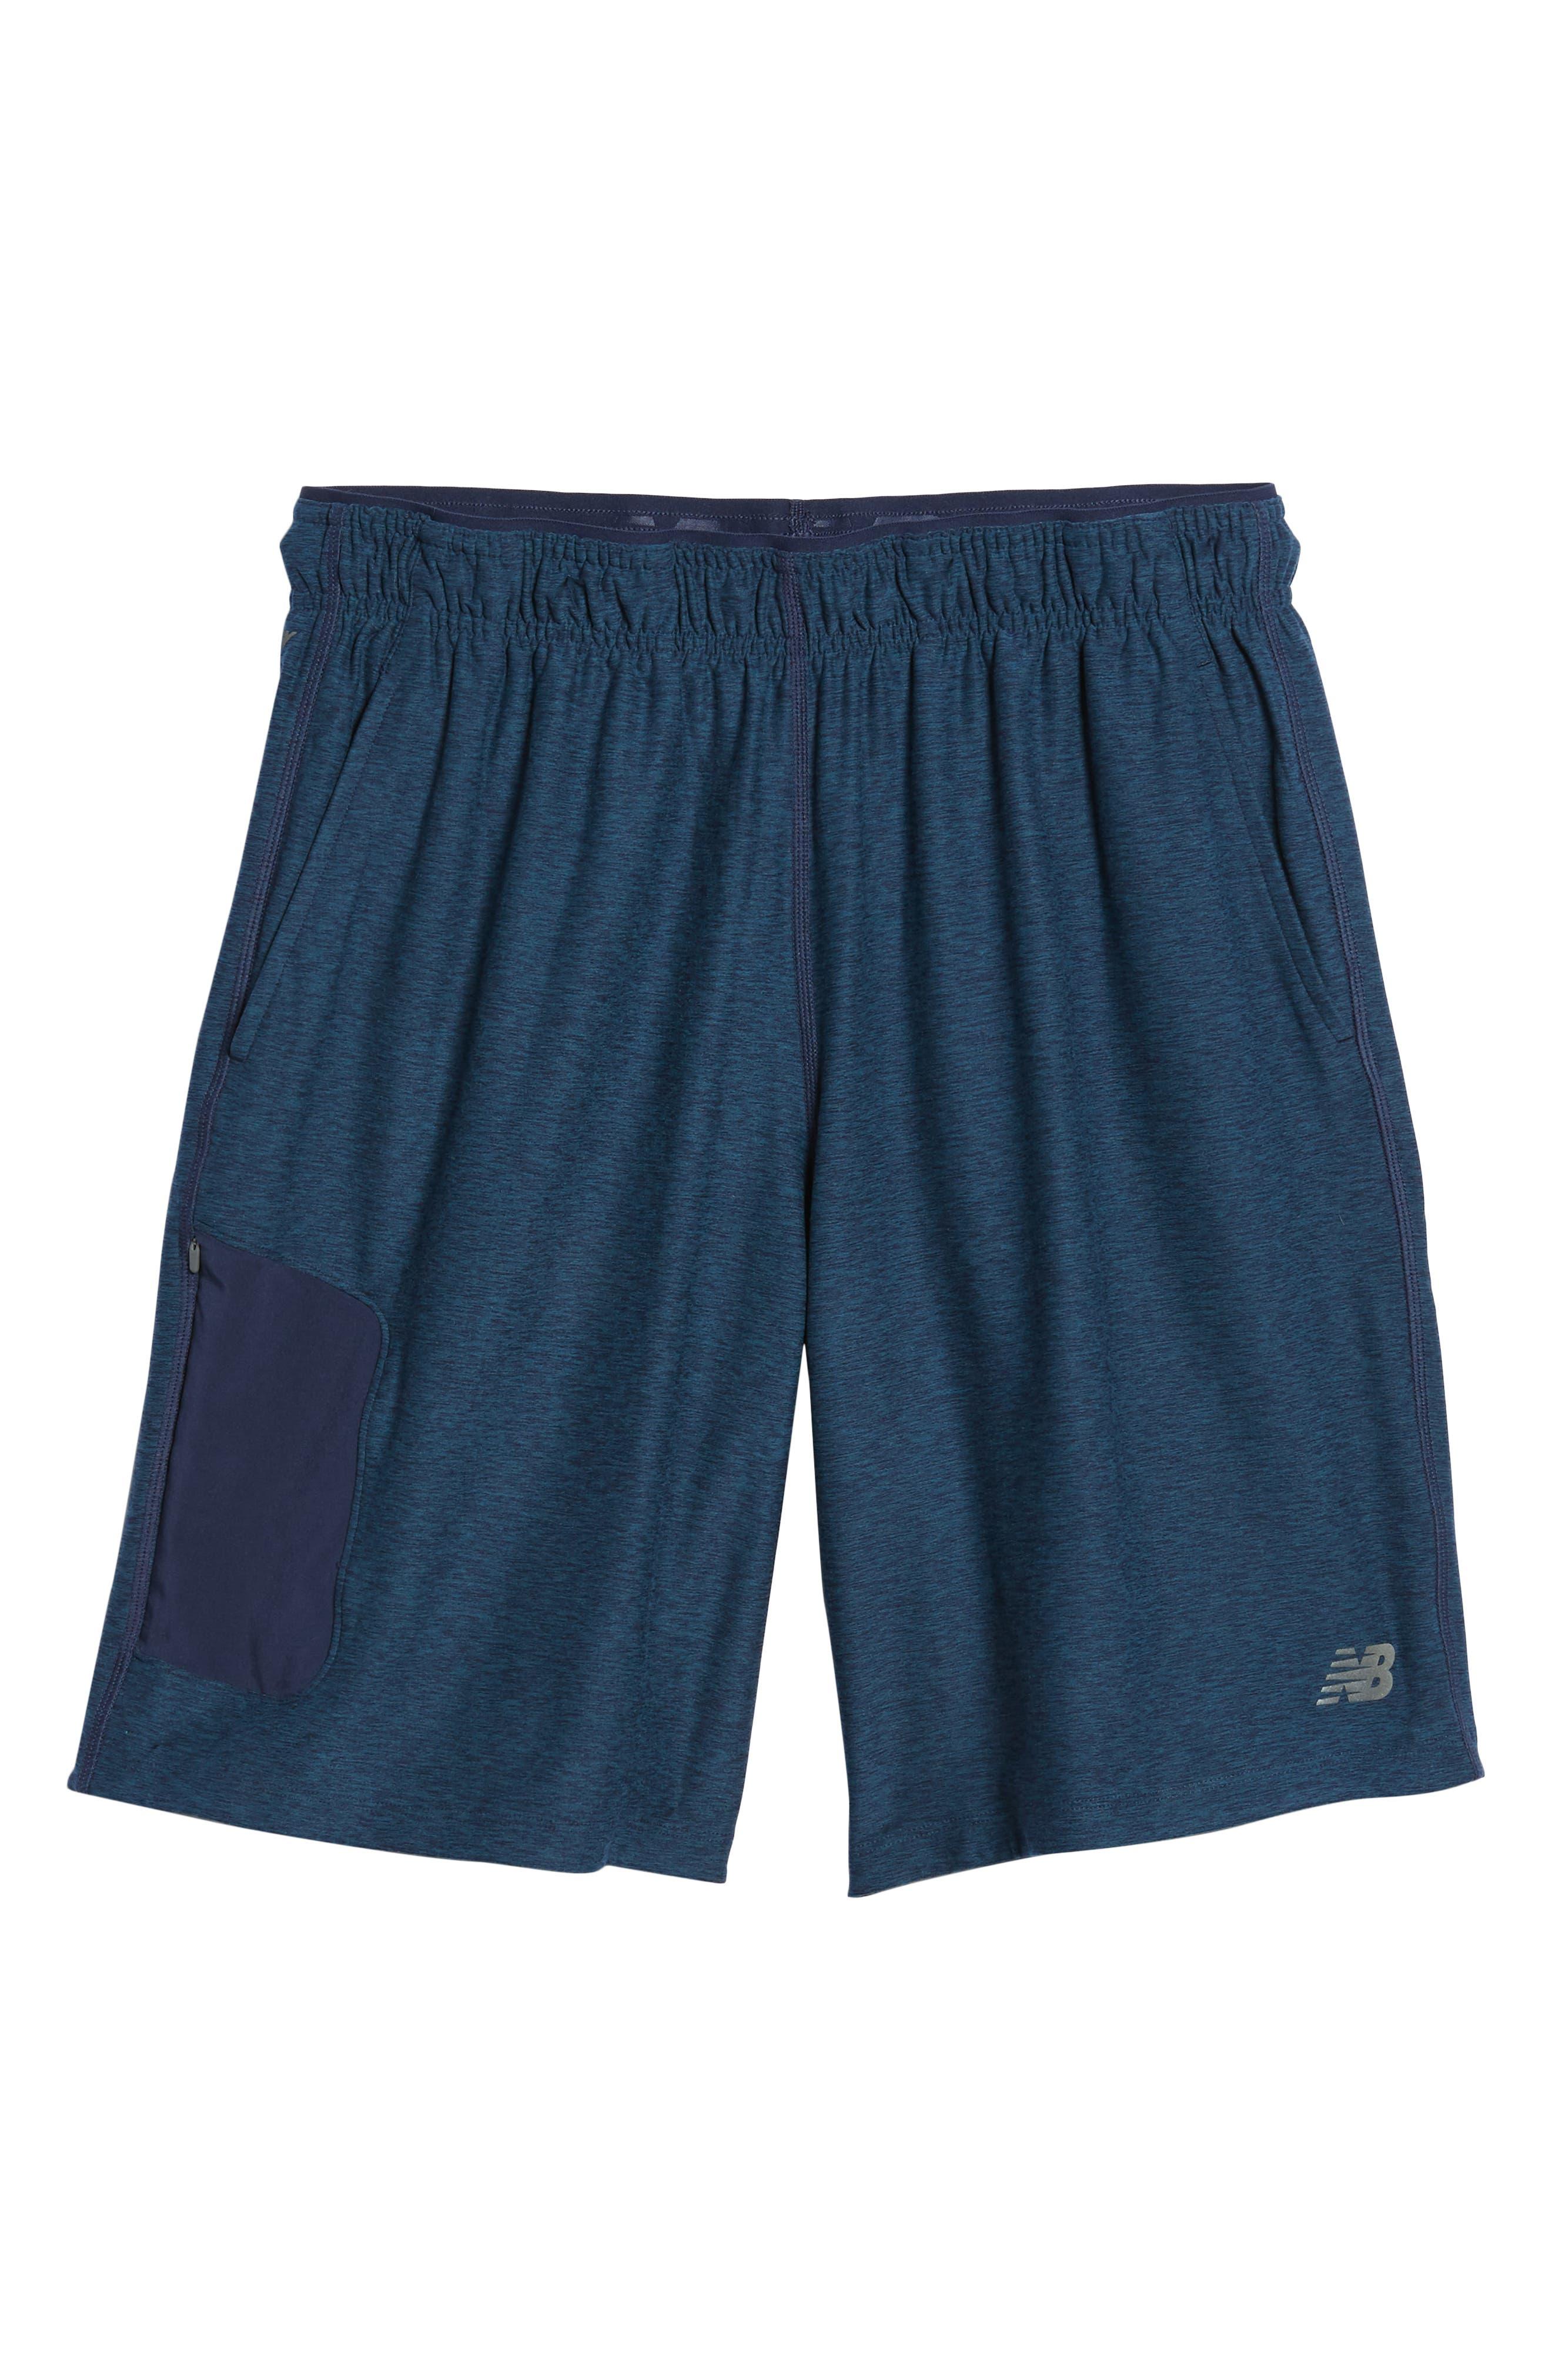 Anticipate Shorts,                             Alternate thumbnail 6, color,                             Pigment